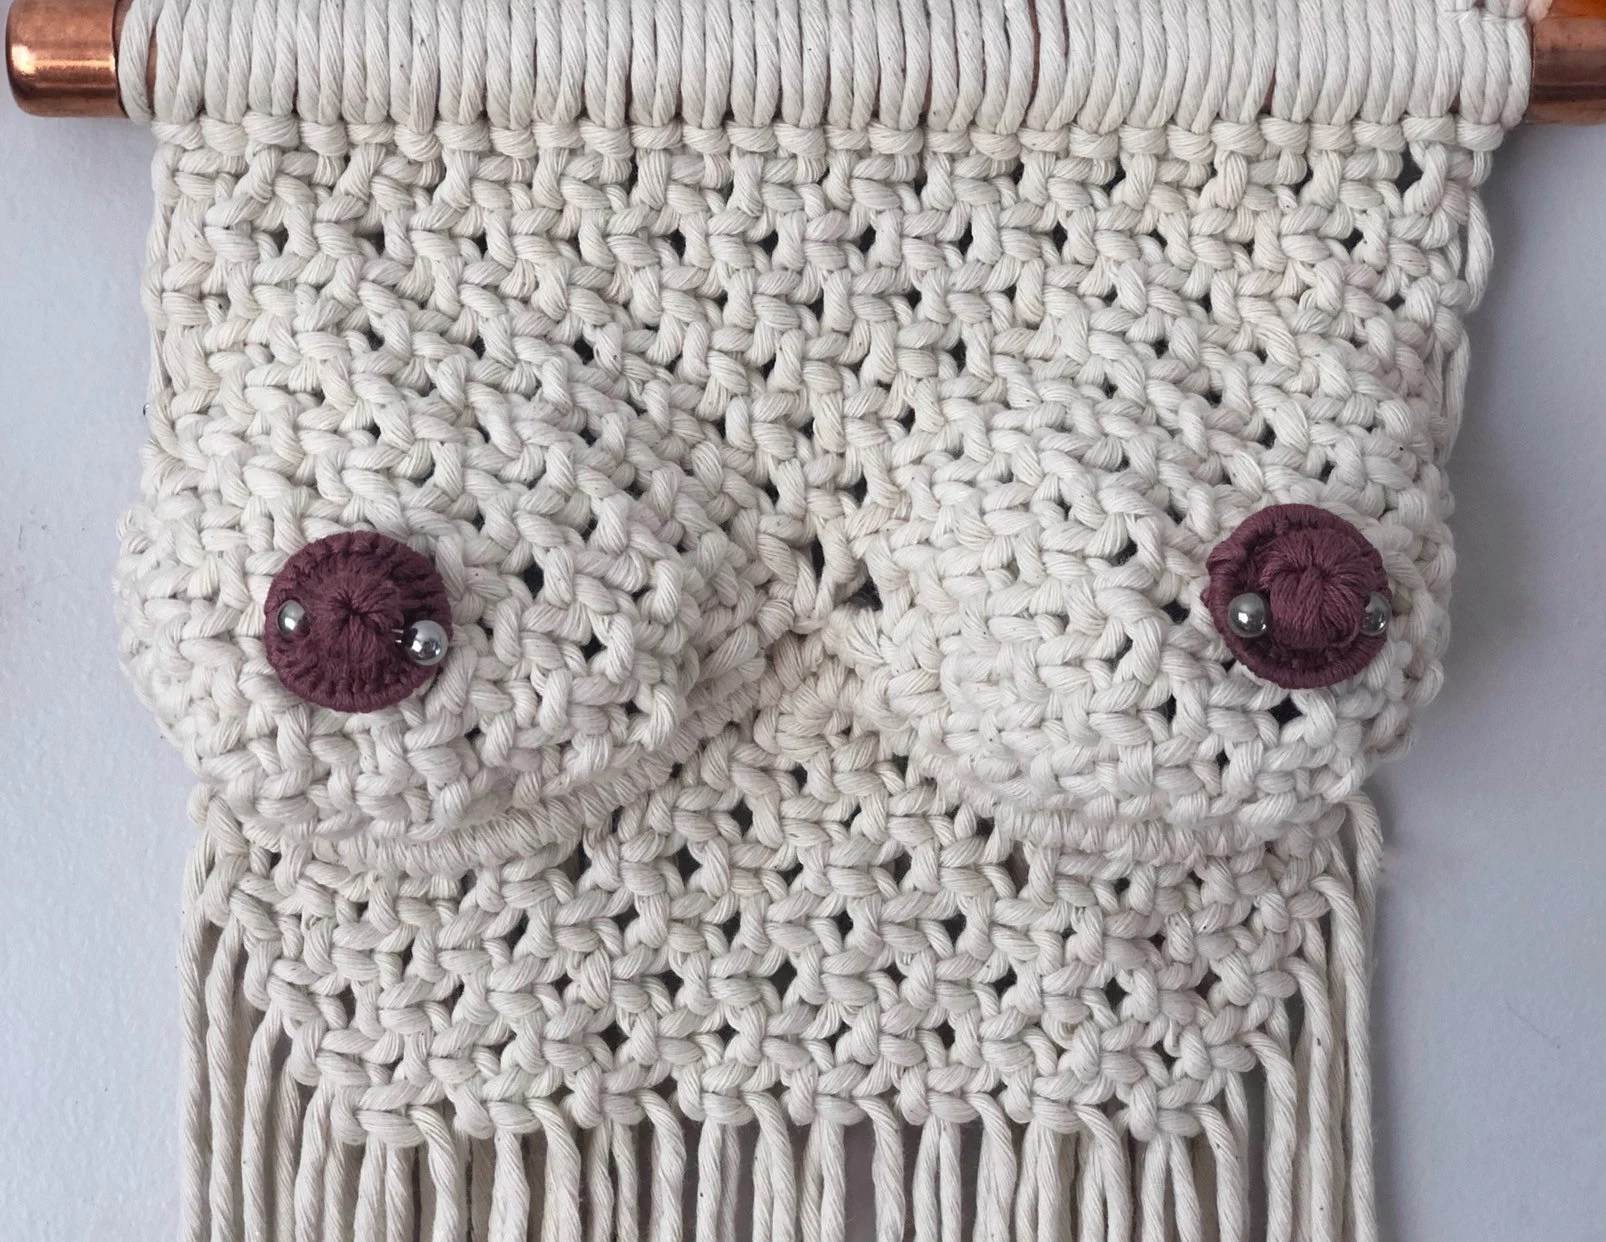 Macrame Boobs/Macrame Boobies/Personalized Breast Wall image 8